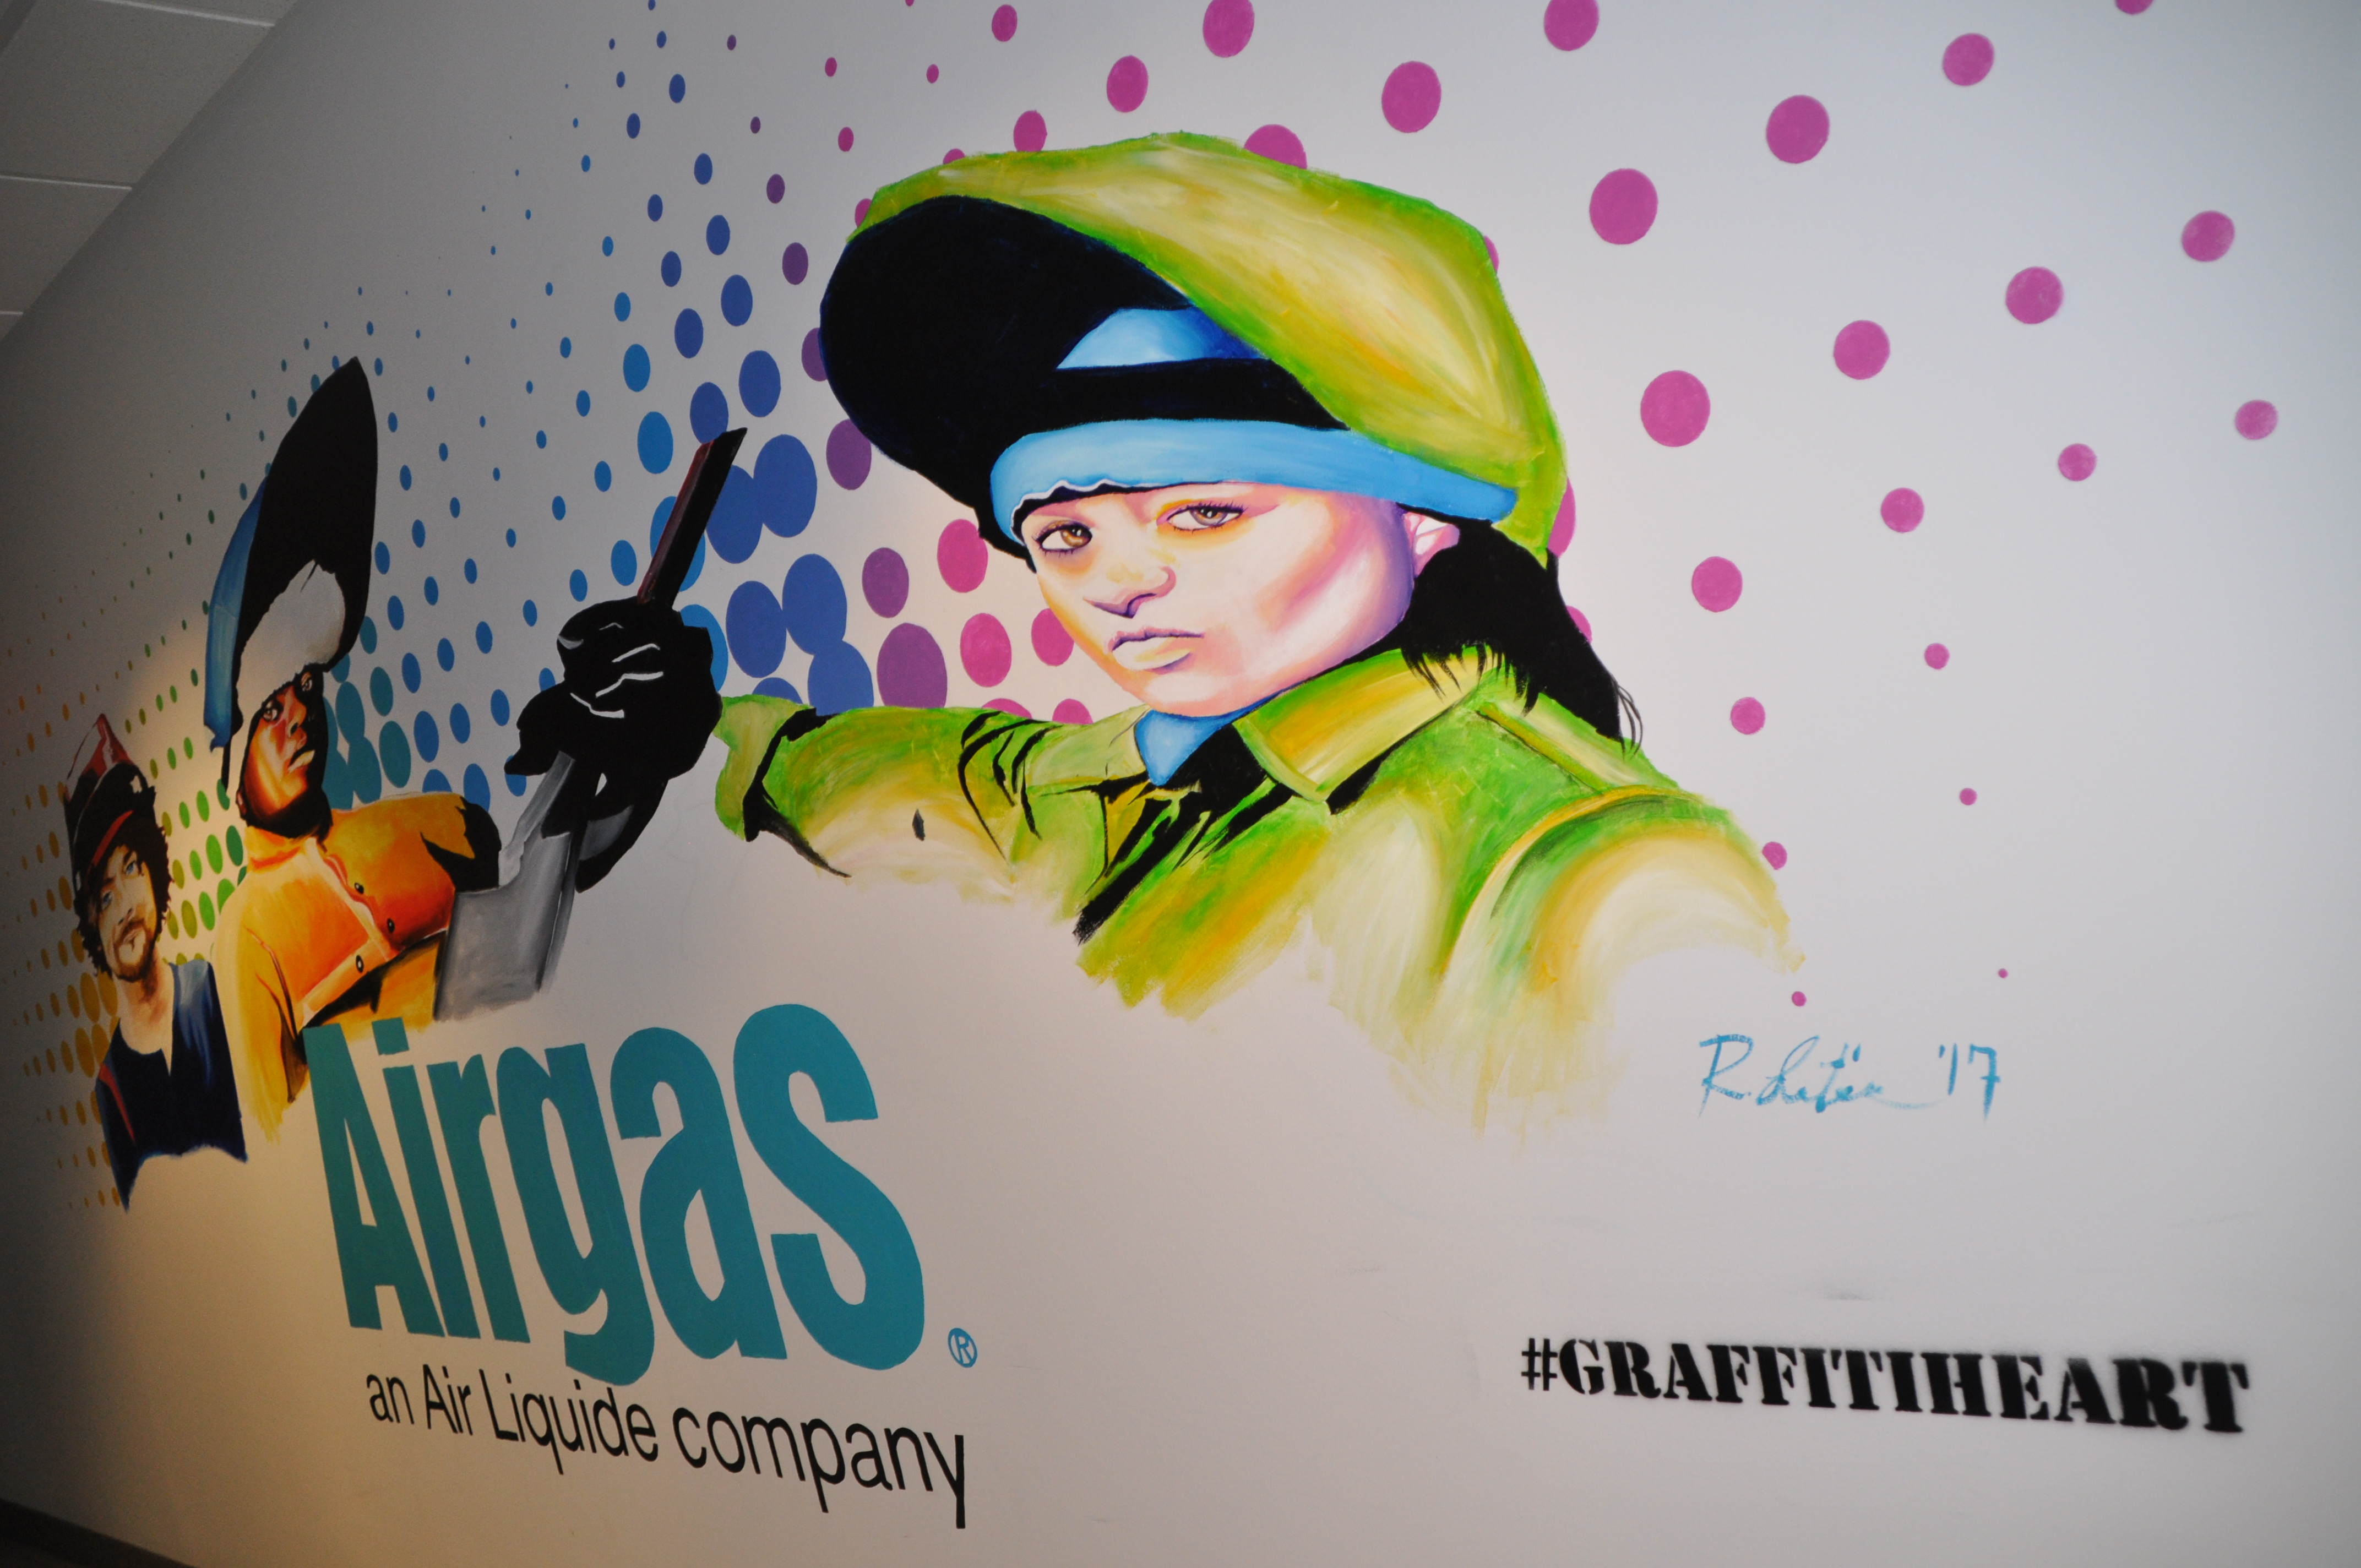 graffiti heart wall street projects invade major corporations